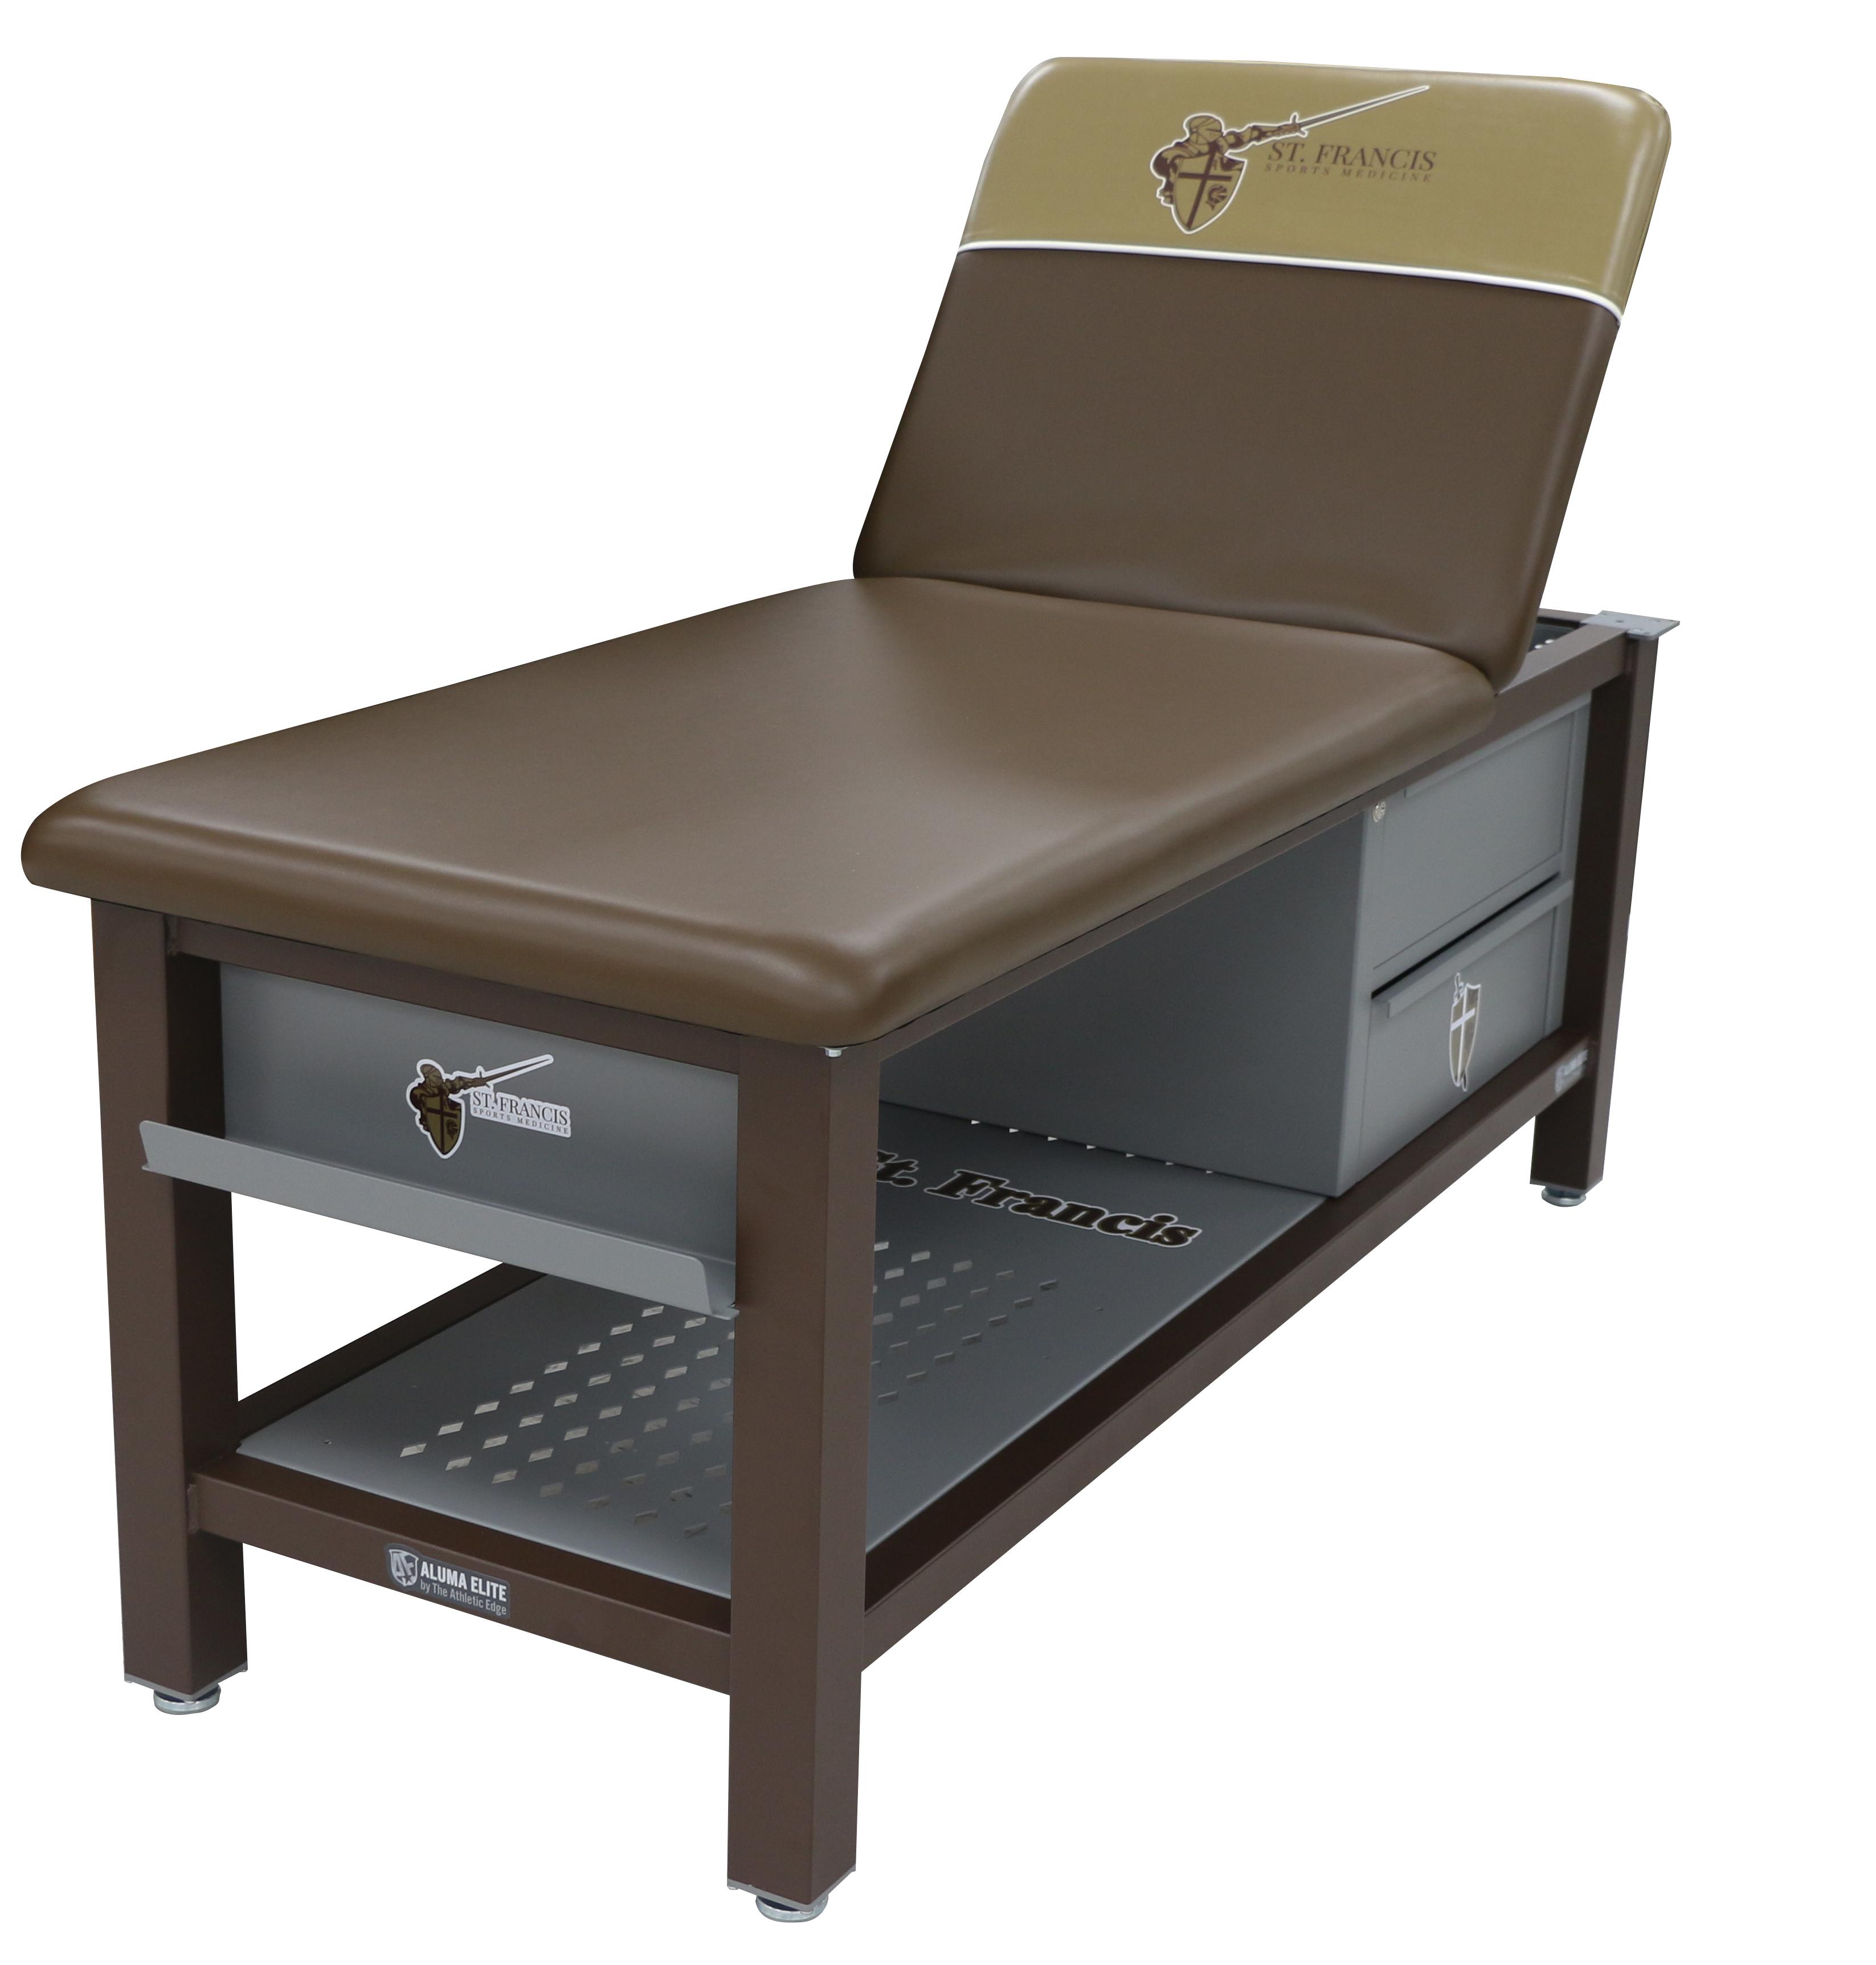 St. Francis HS-(Aluma Elite Treatment Table)